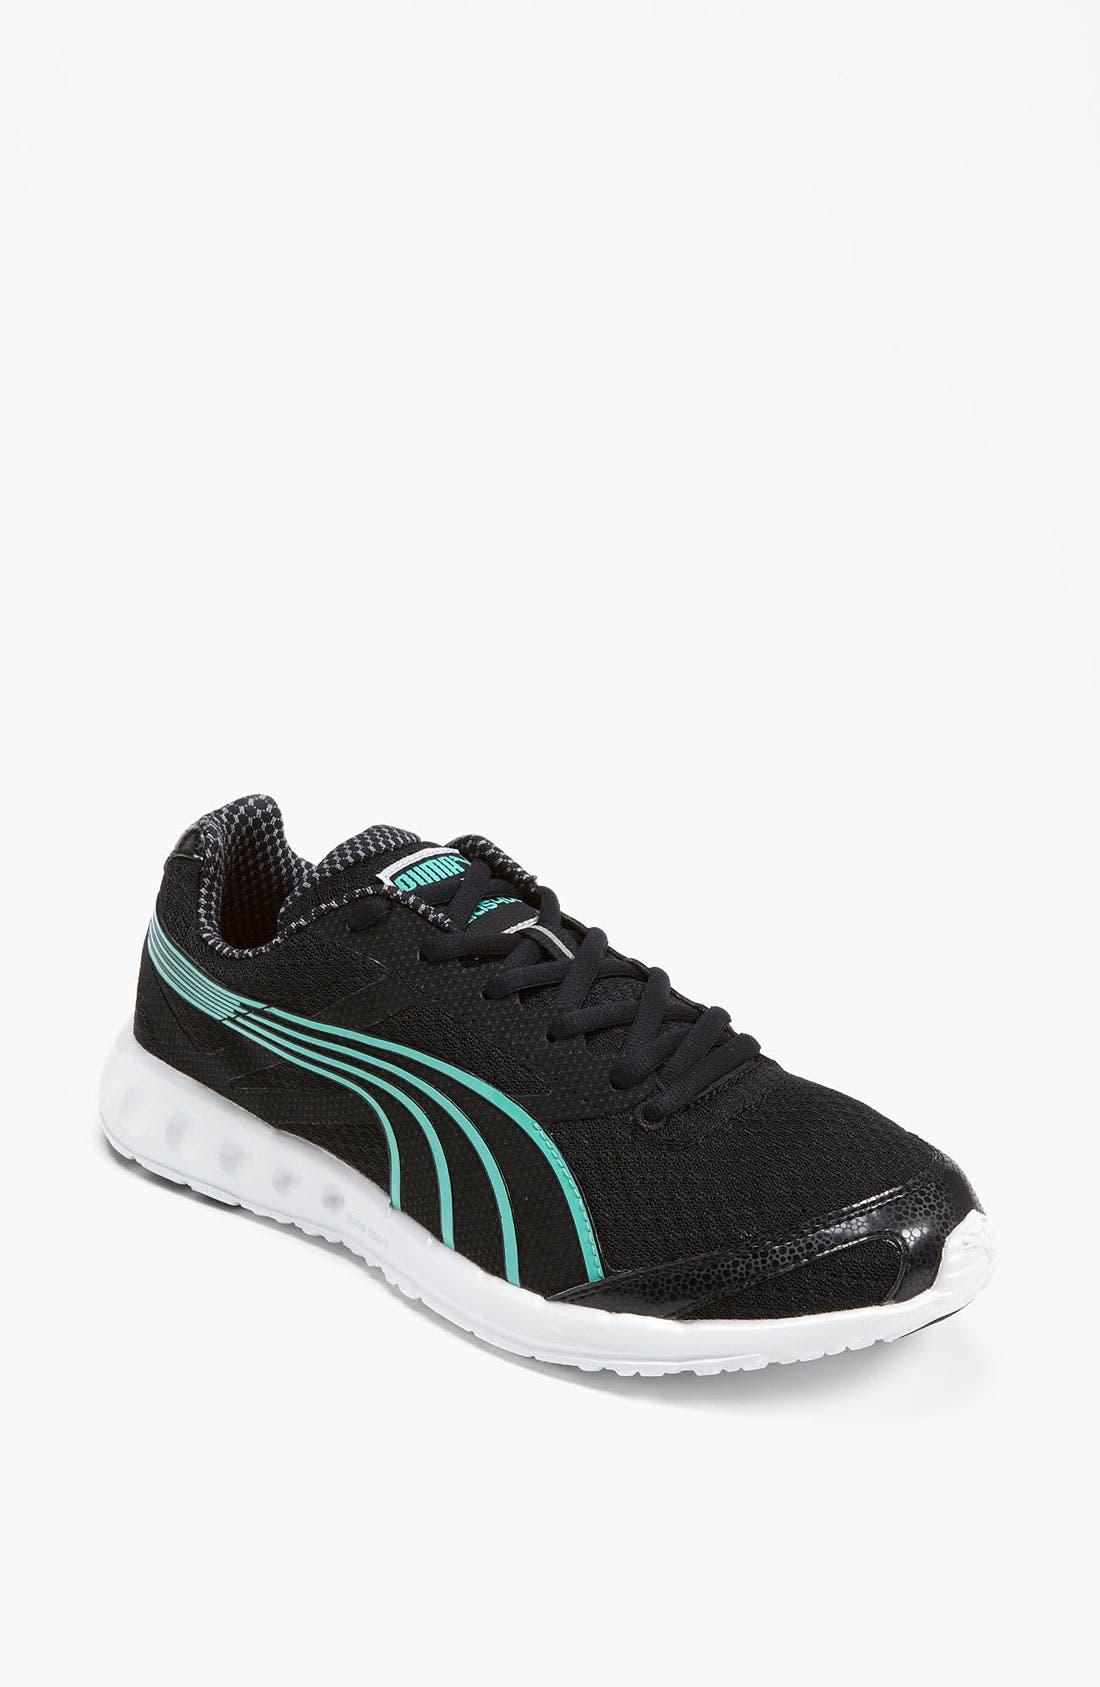 Main Image - PUMA 'Faas 400' Sneaker (Women)